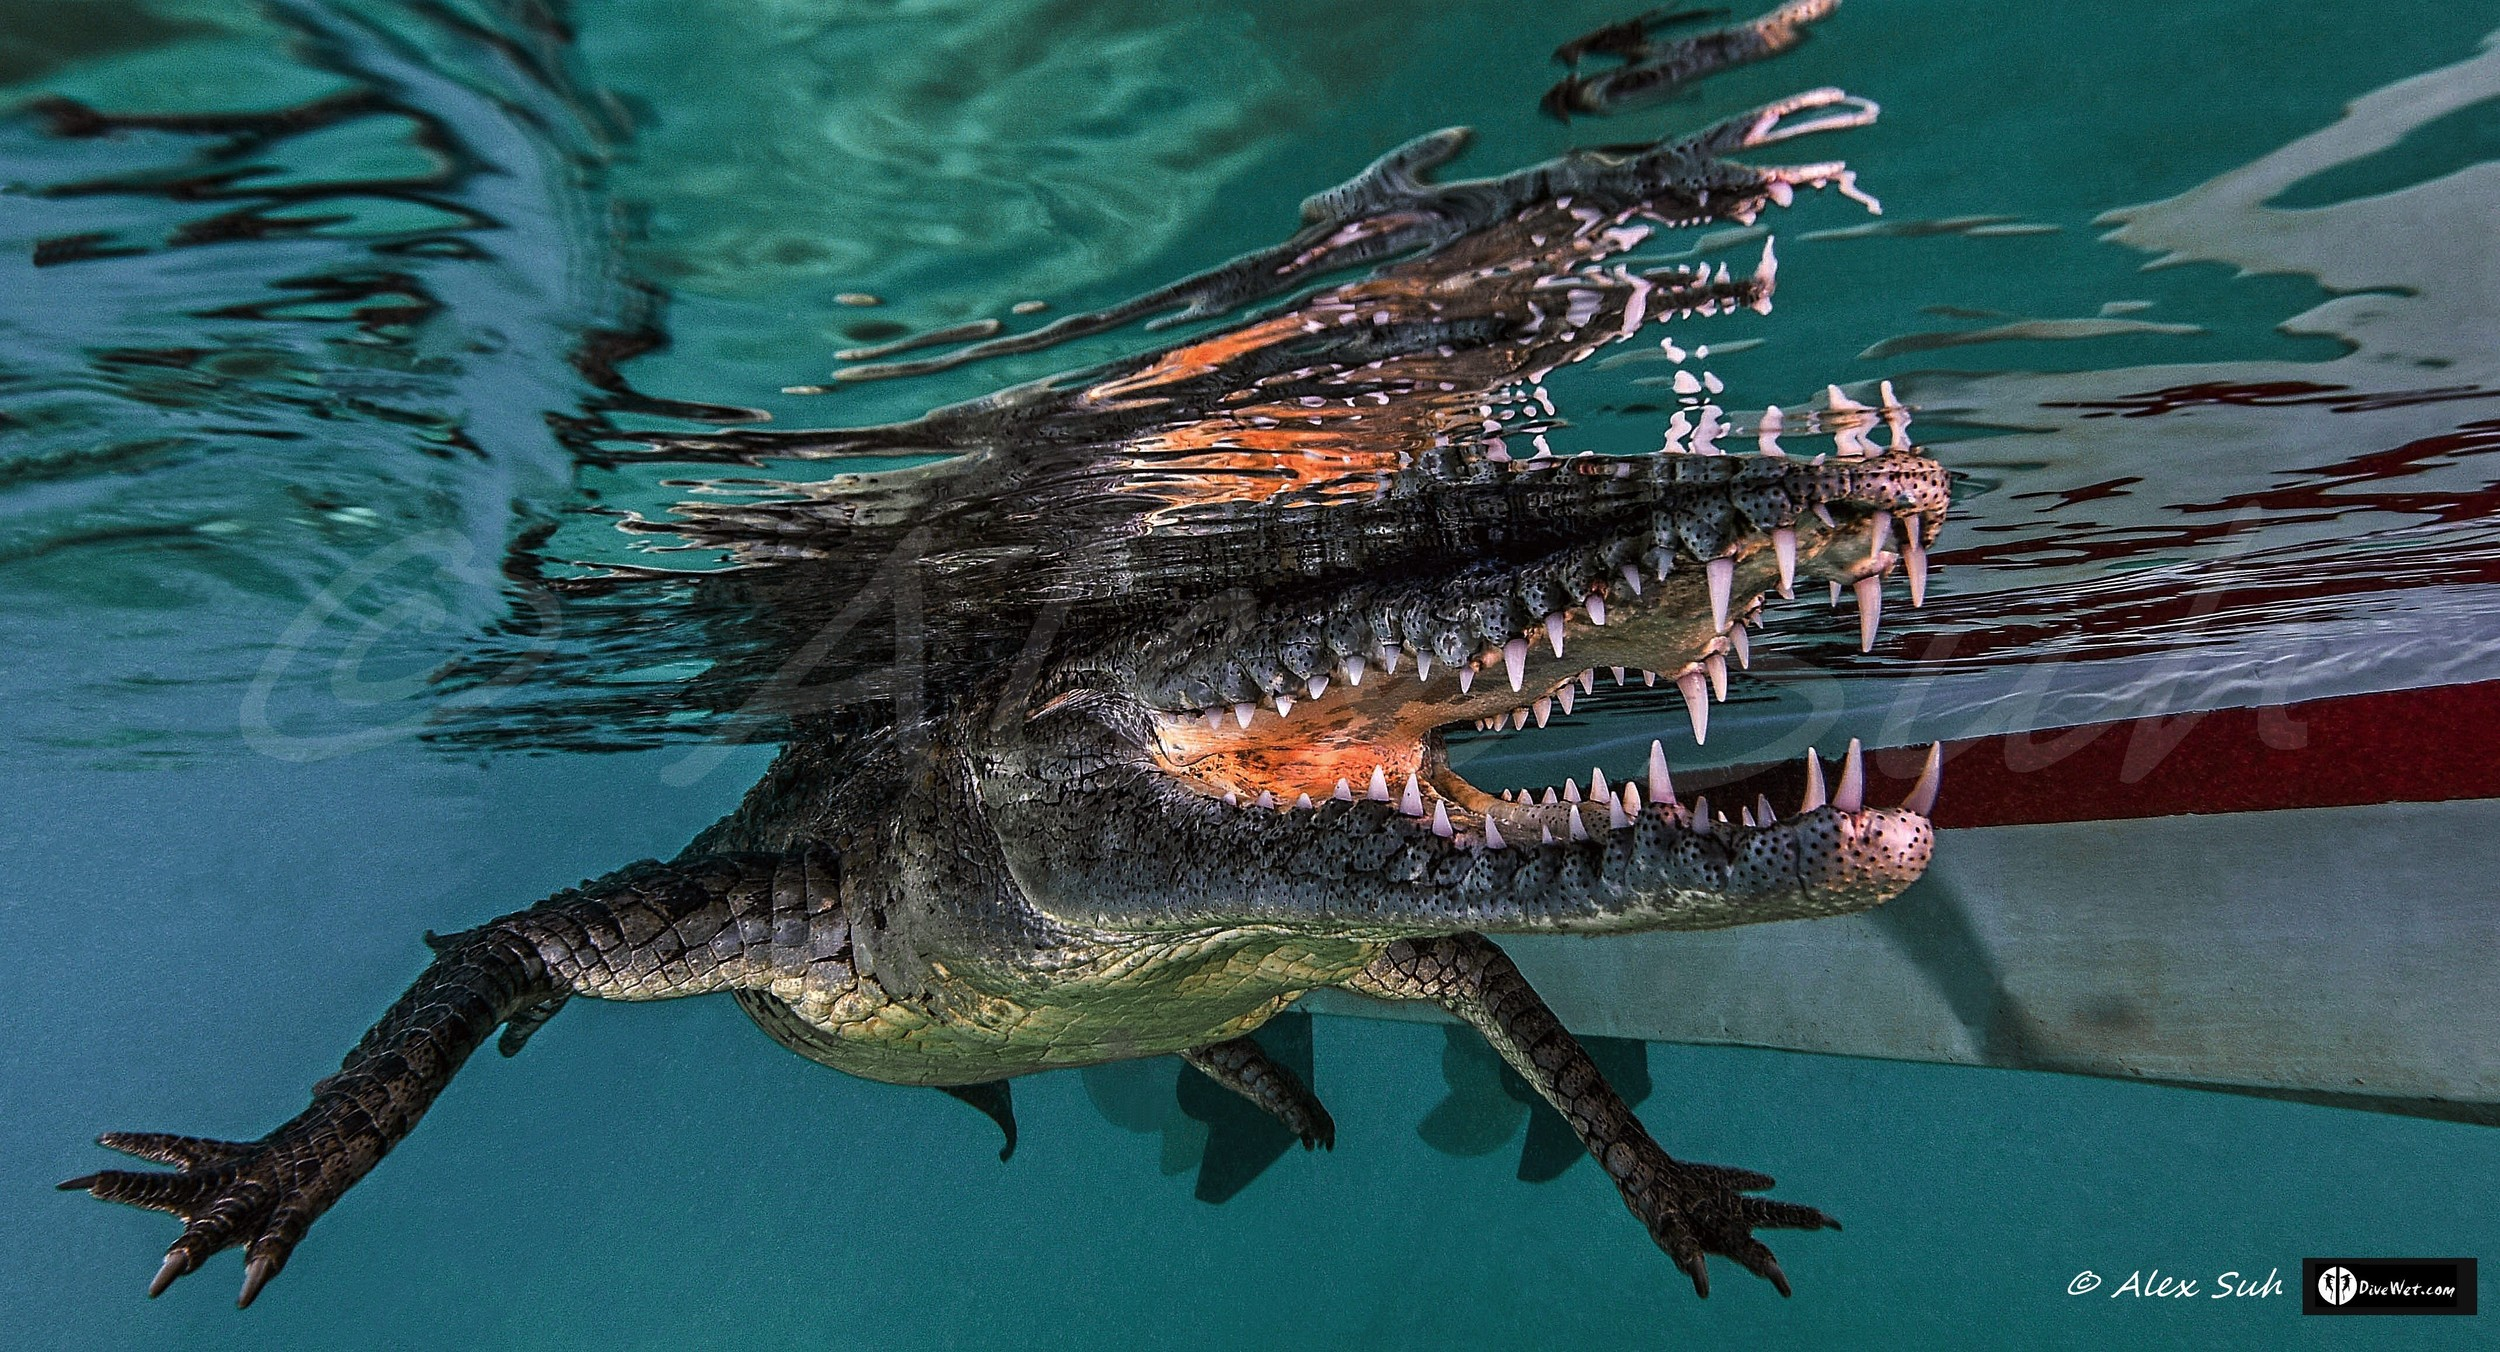 American Crocodile (Crocodylus acutus) - Image taken while snorkeling next to boat